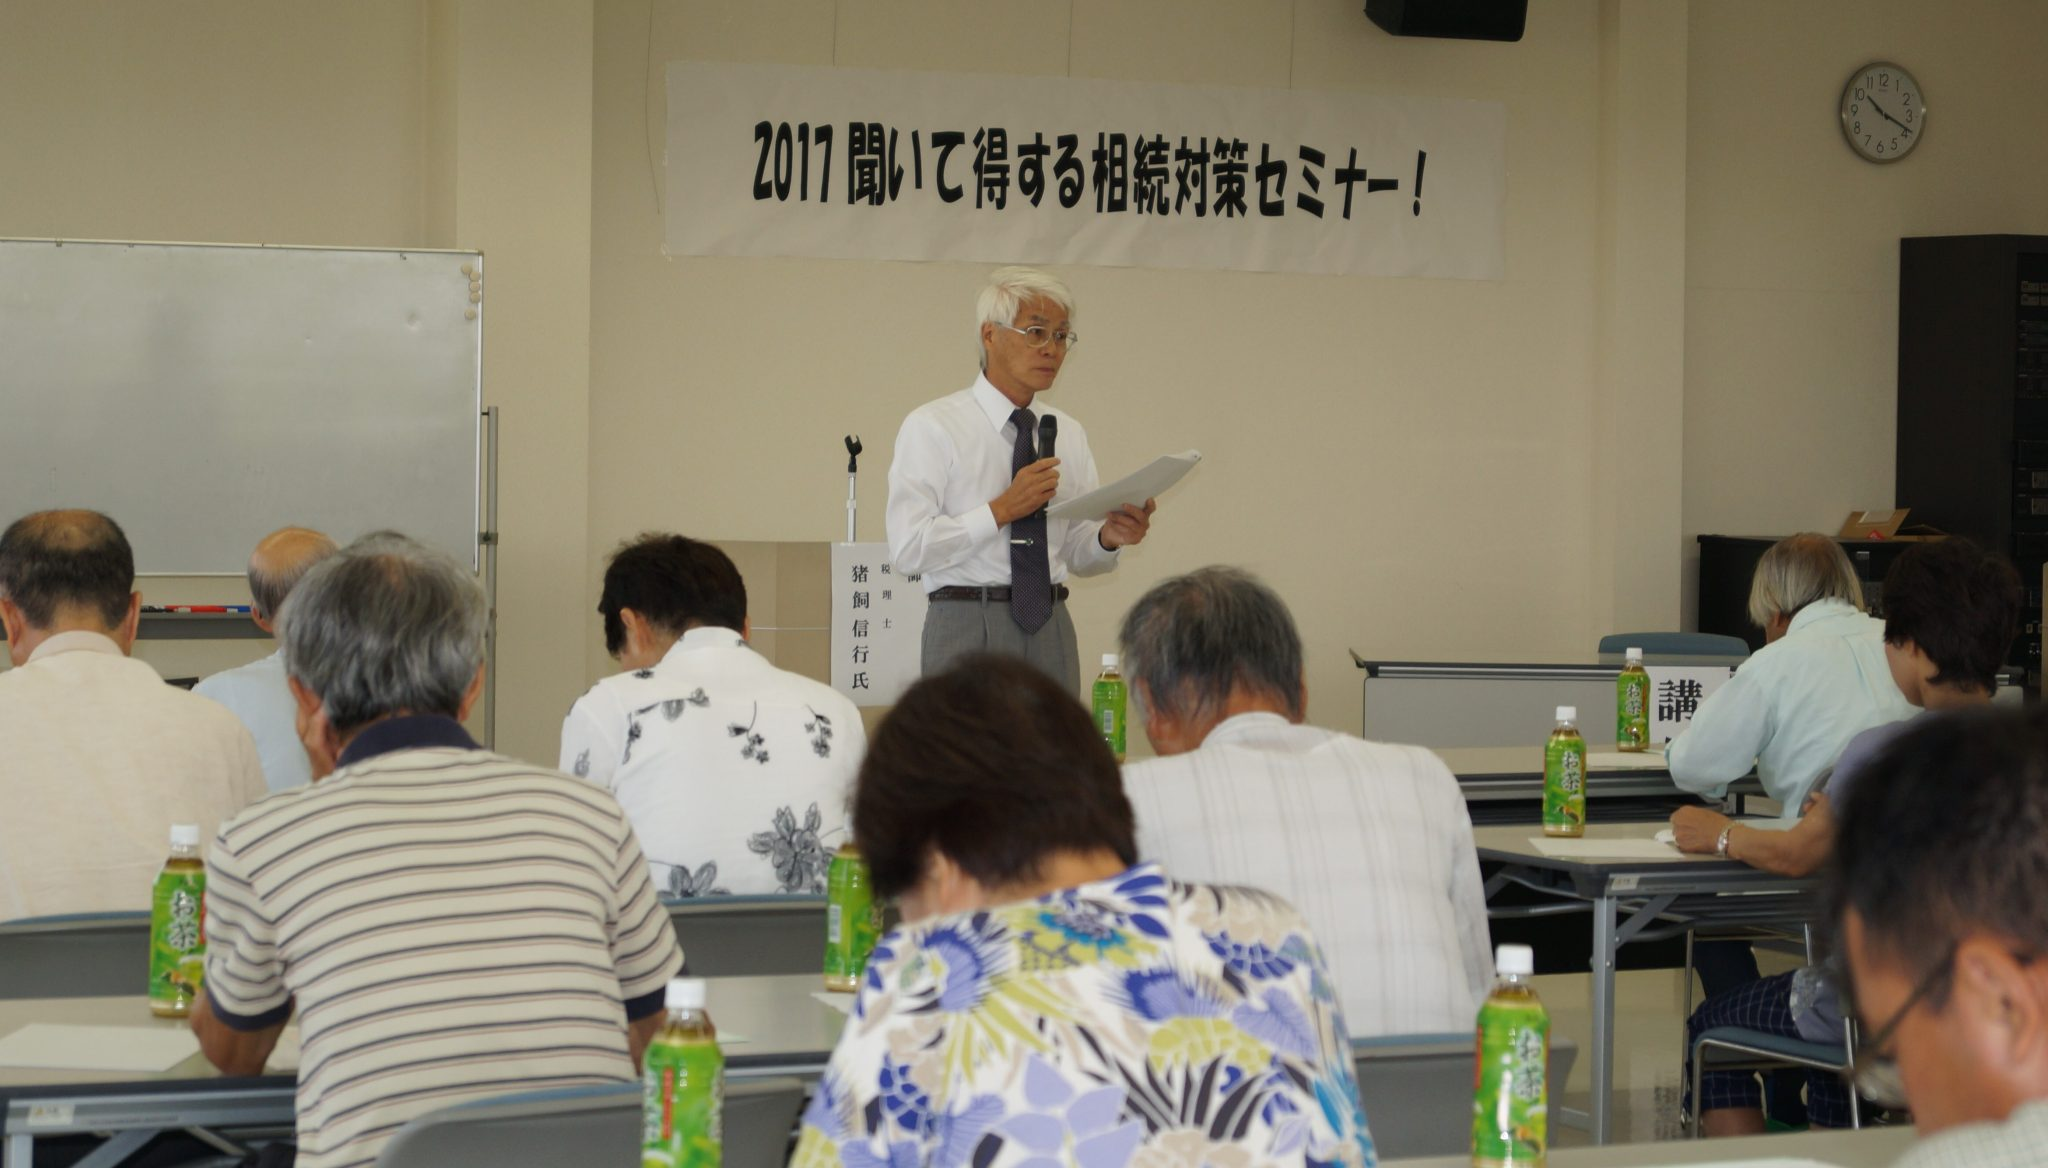 JA 海部東農業協同組合(あまひがし) -資産管理課 相続対策セミナー開催!